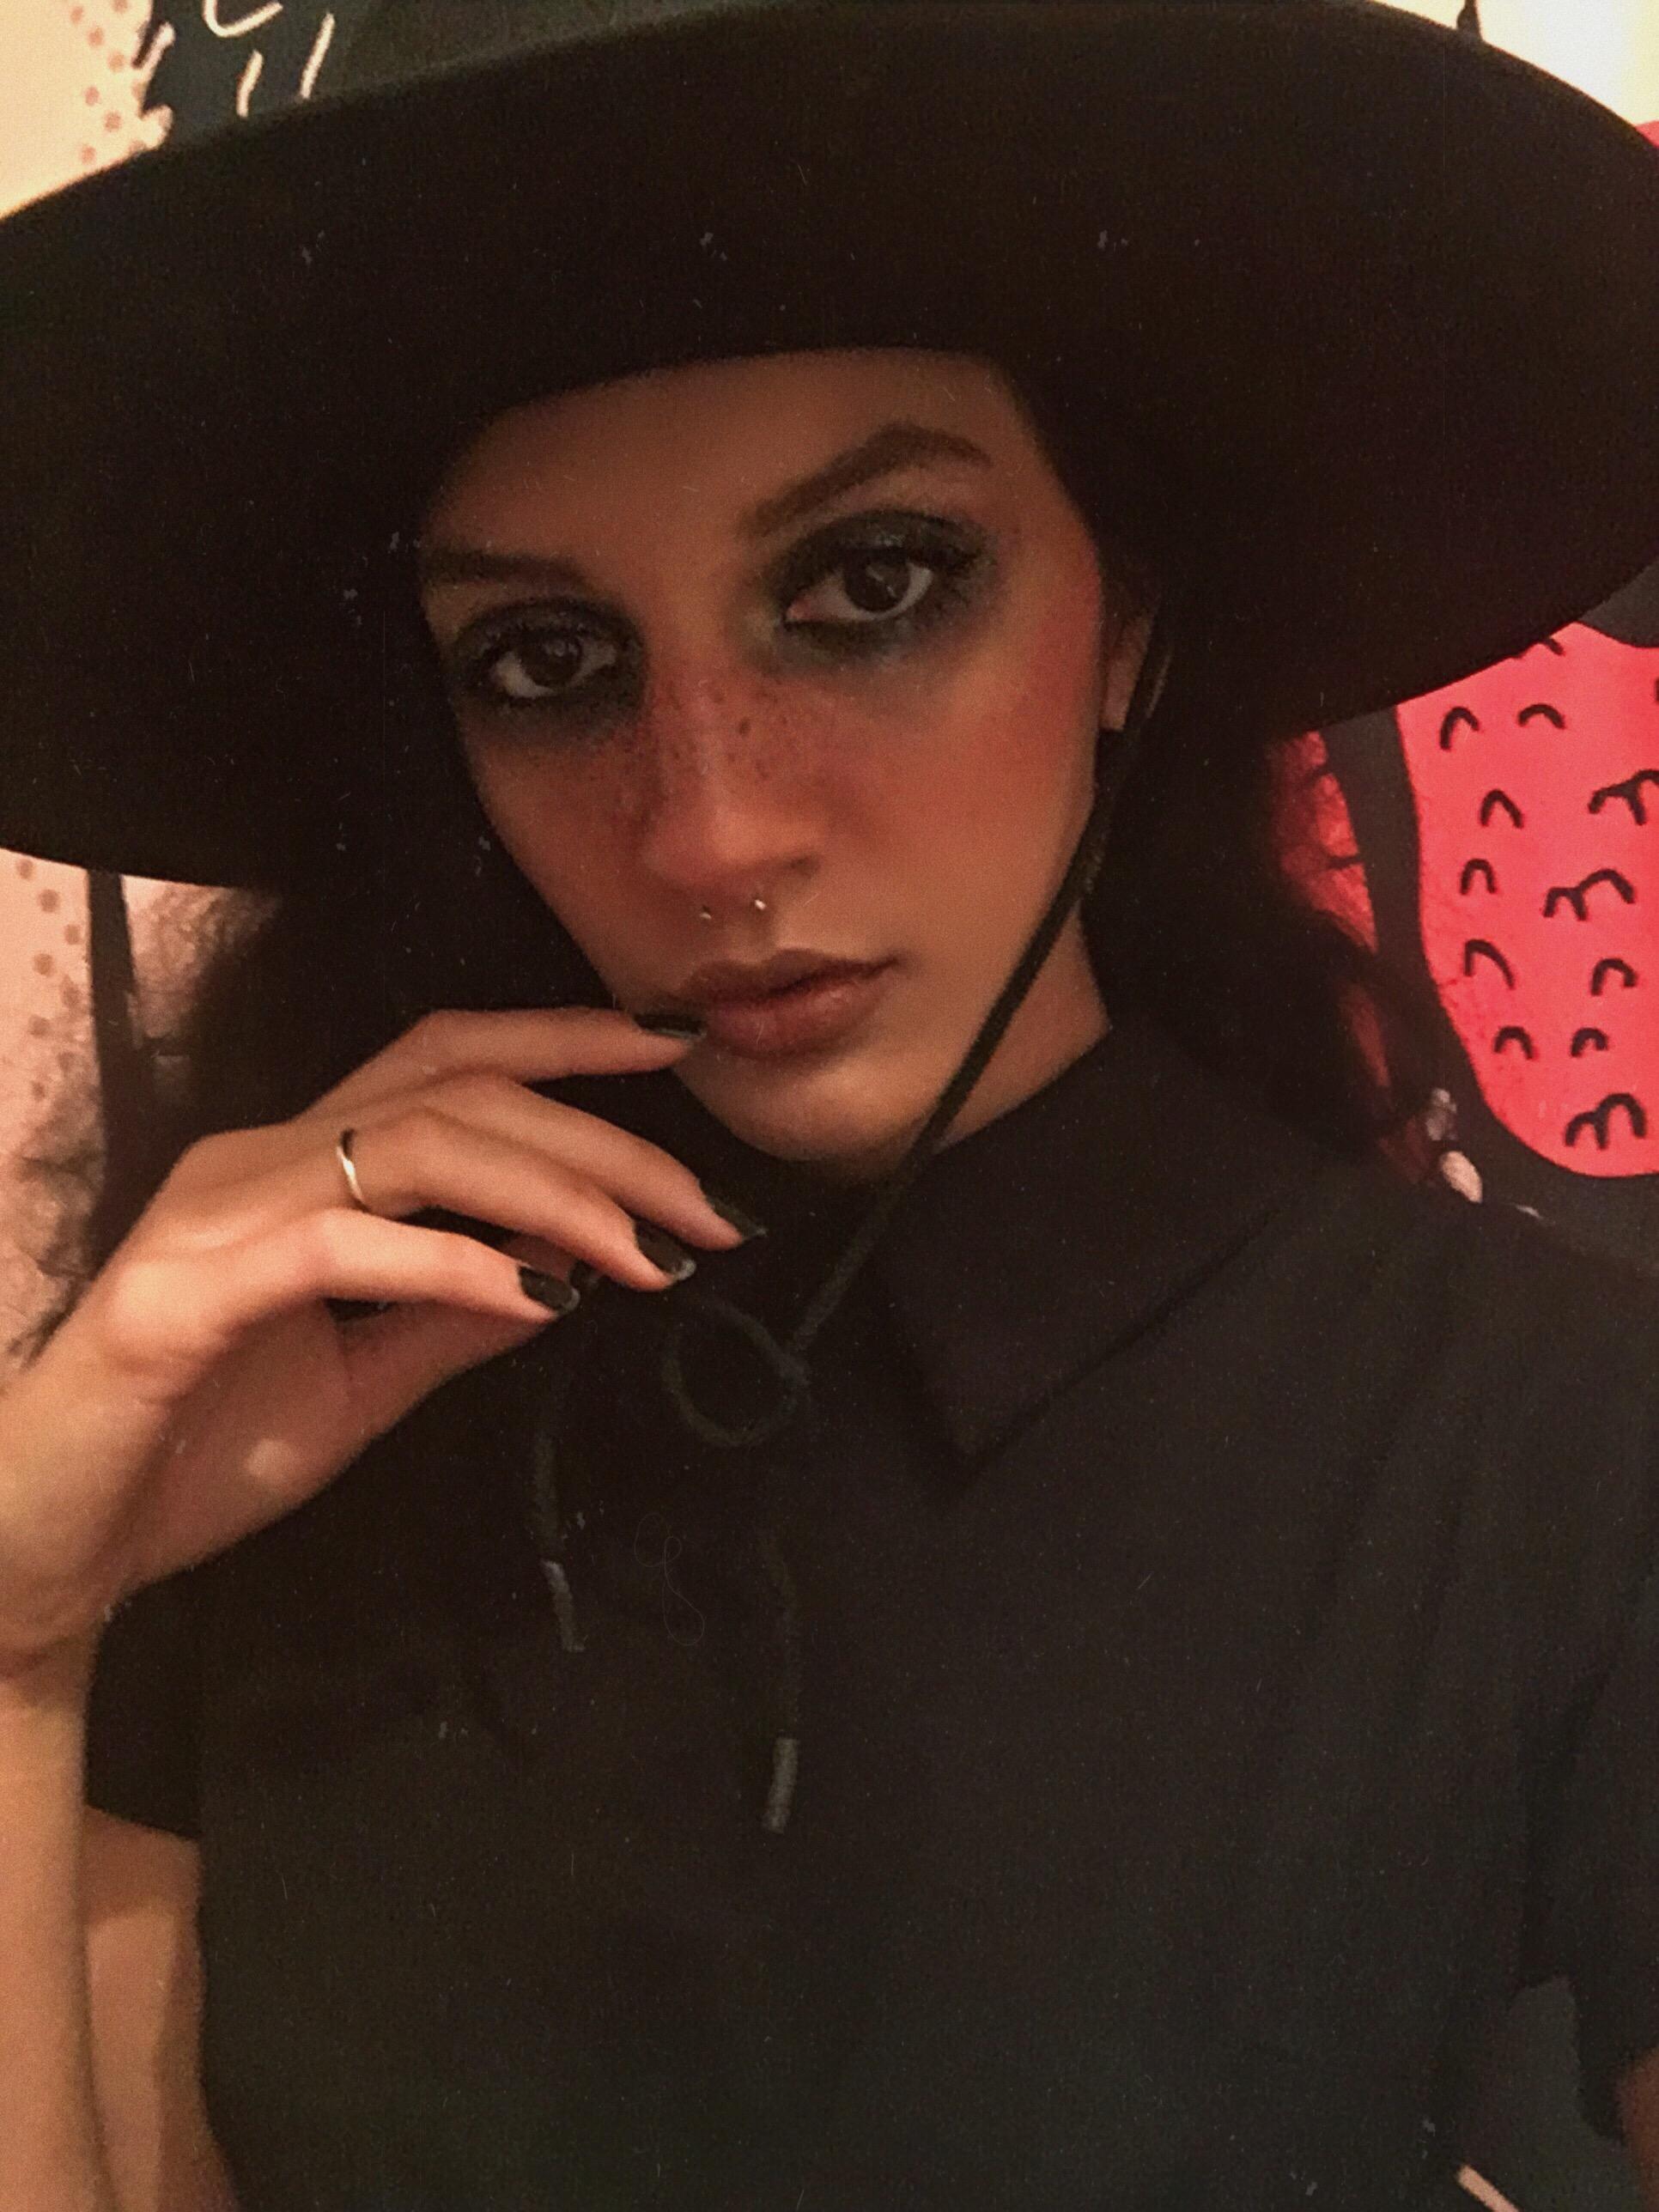 Aniyahlationn_Halloween_Deandri_3.JPG